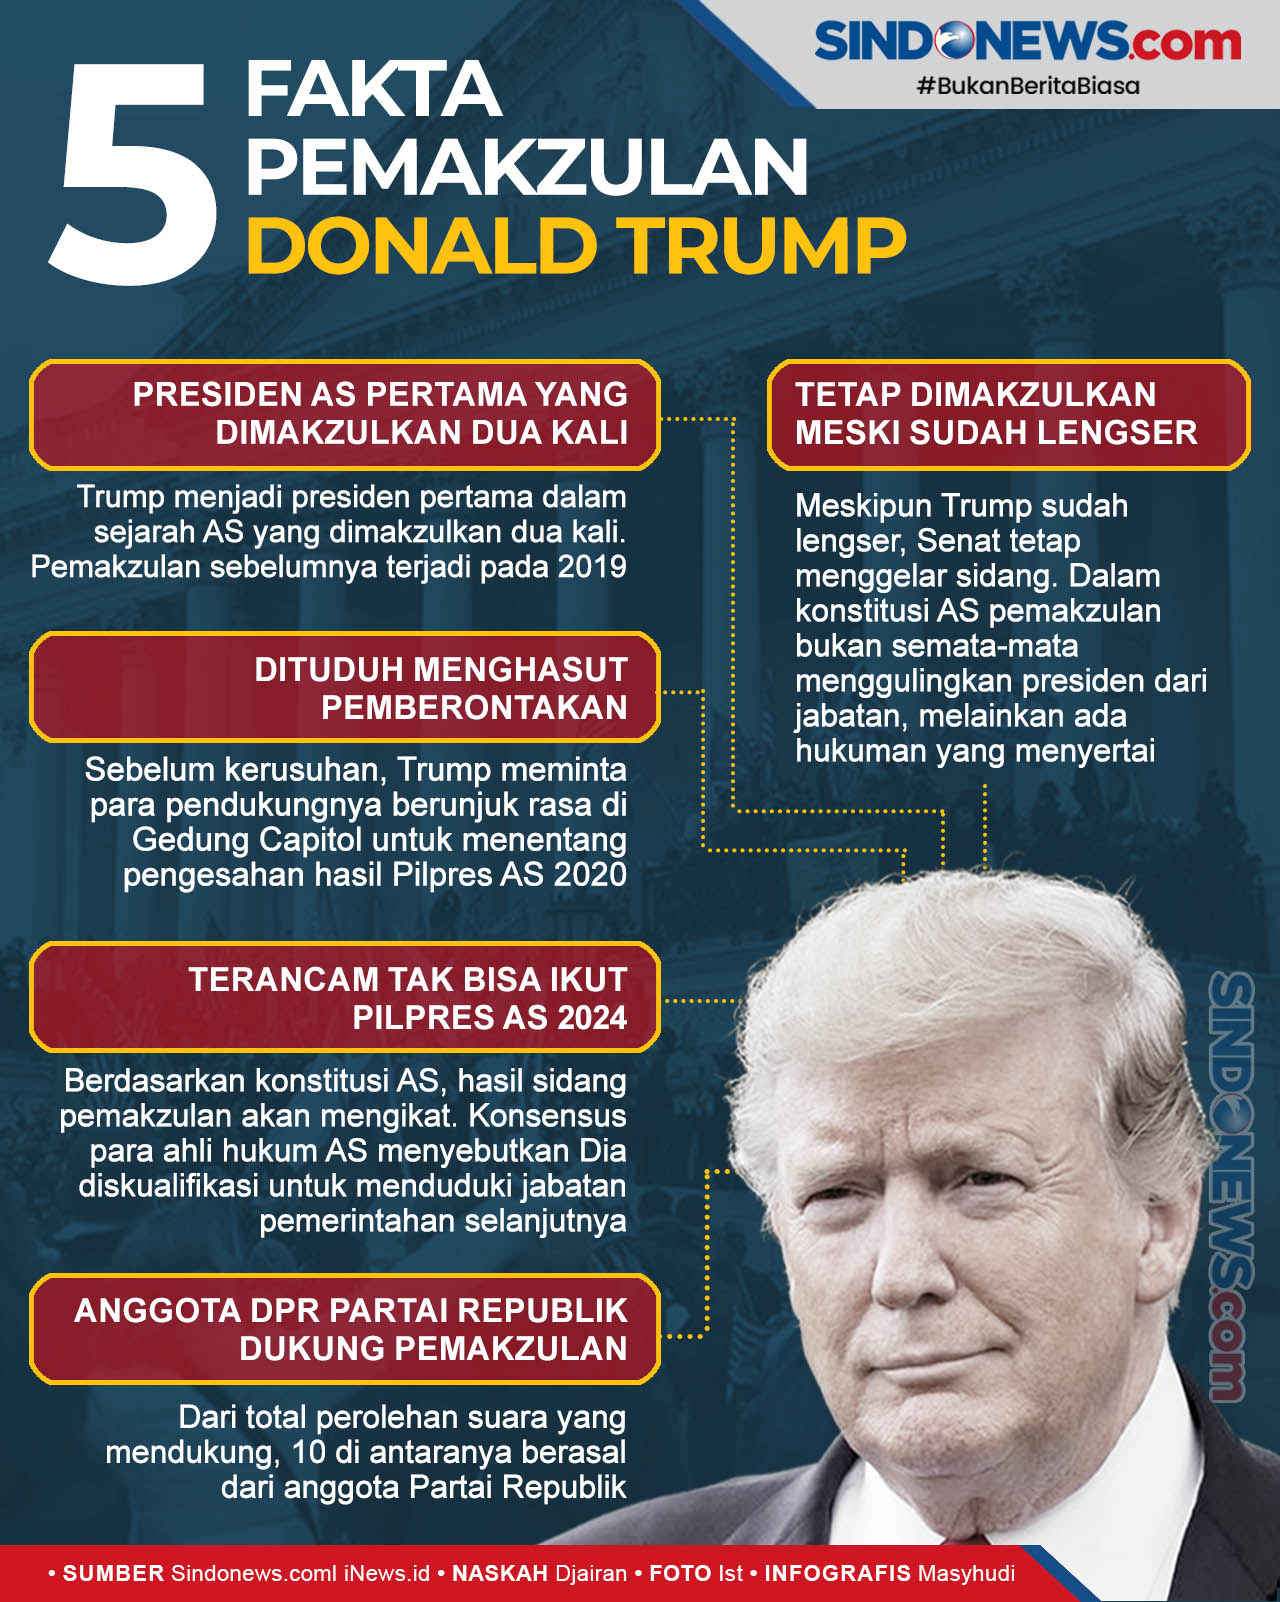 Fakta-Fakta Pemakzulan Presiden AS Donald Trump